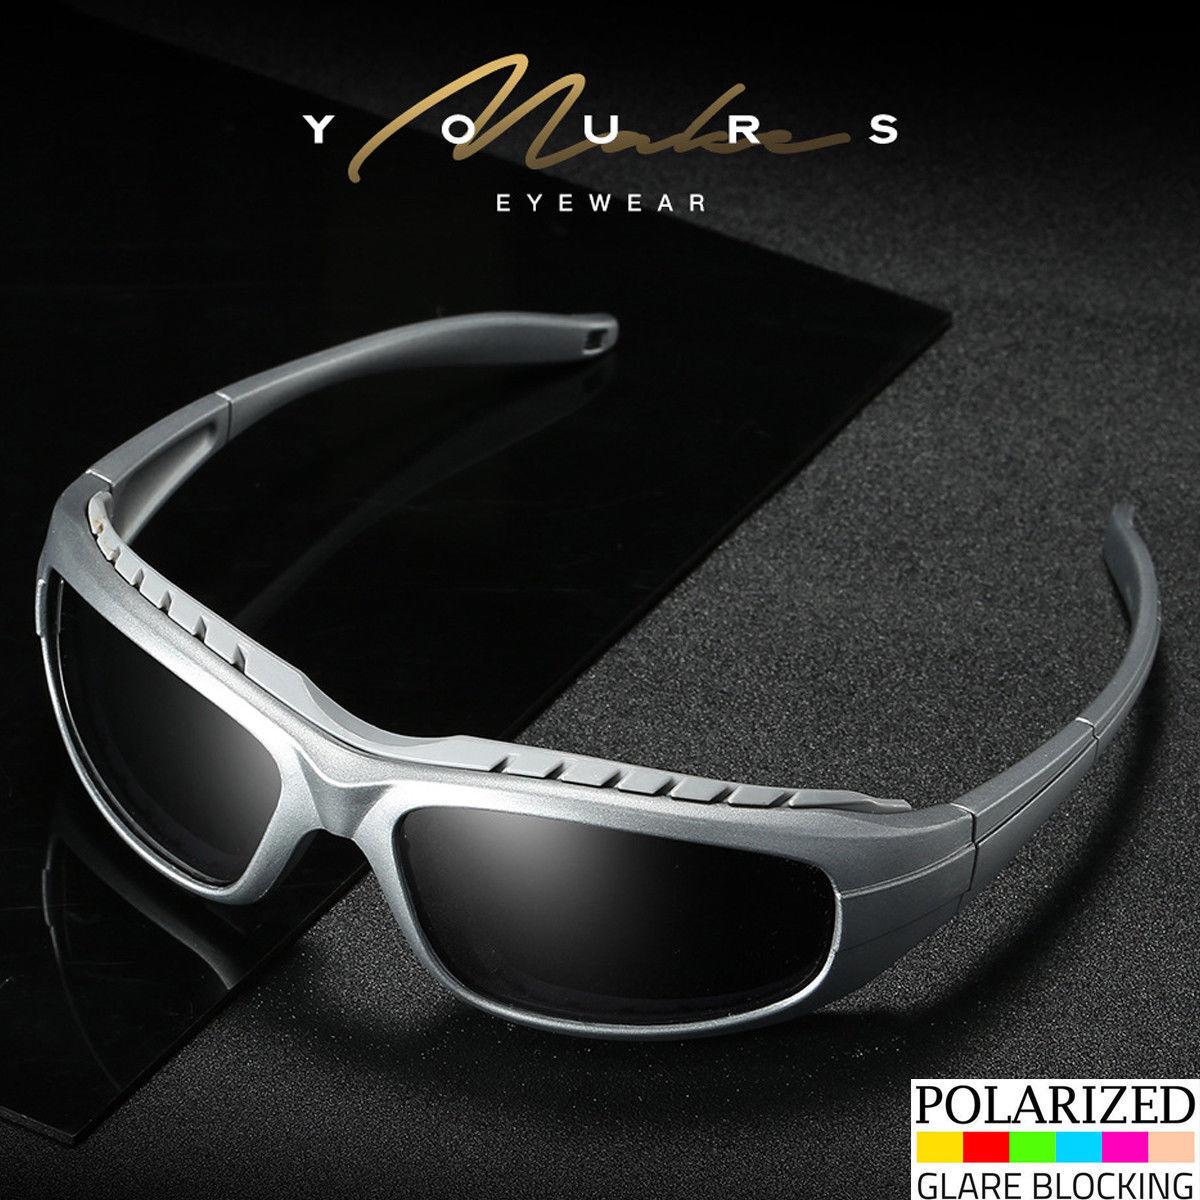 ... очки Polarized Anti Glare Padded Wind Resistant Sunglasses Motorcycle  Riding Glasses - 253385619058 - купить на eBay.com (США) с доставкой в  Украину ... 55fb3aebe2f